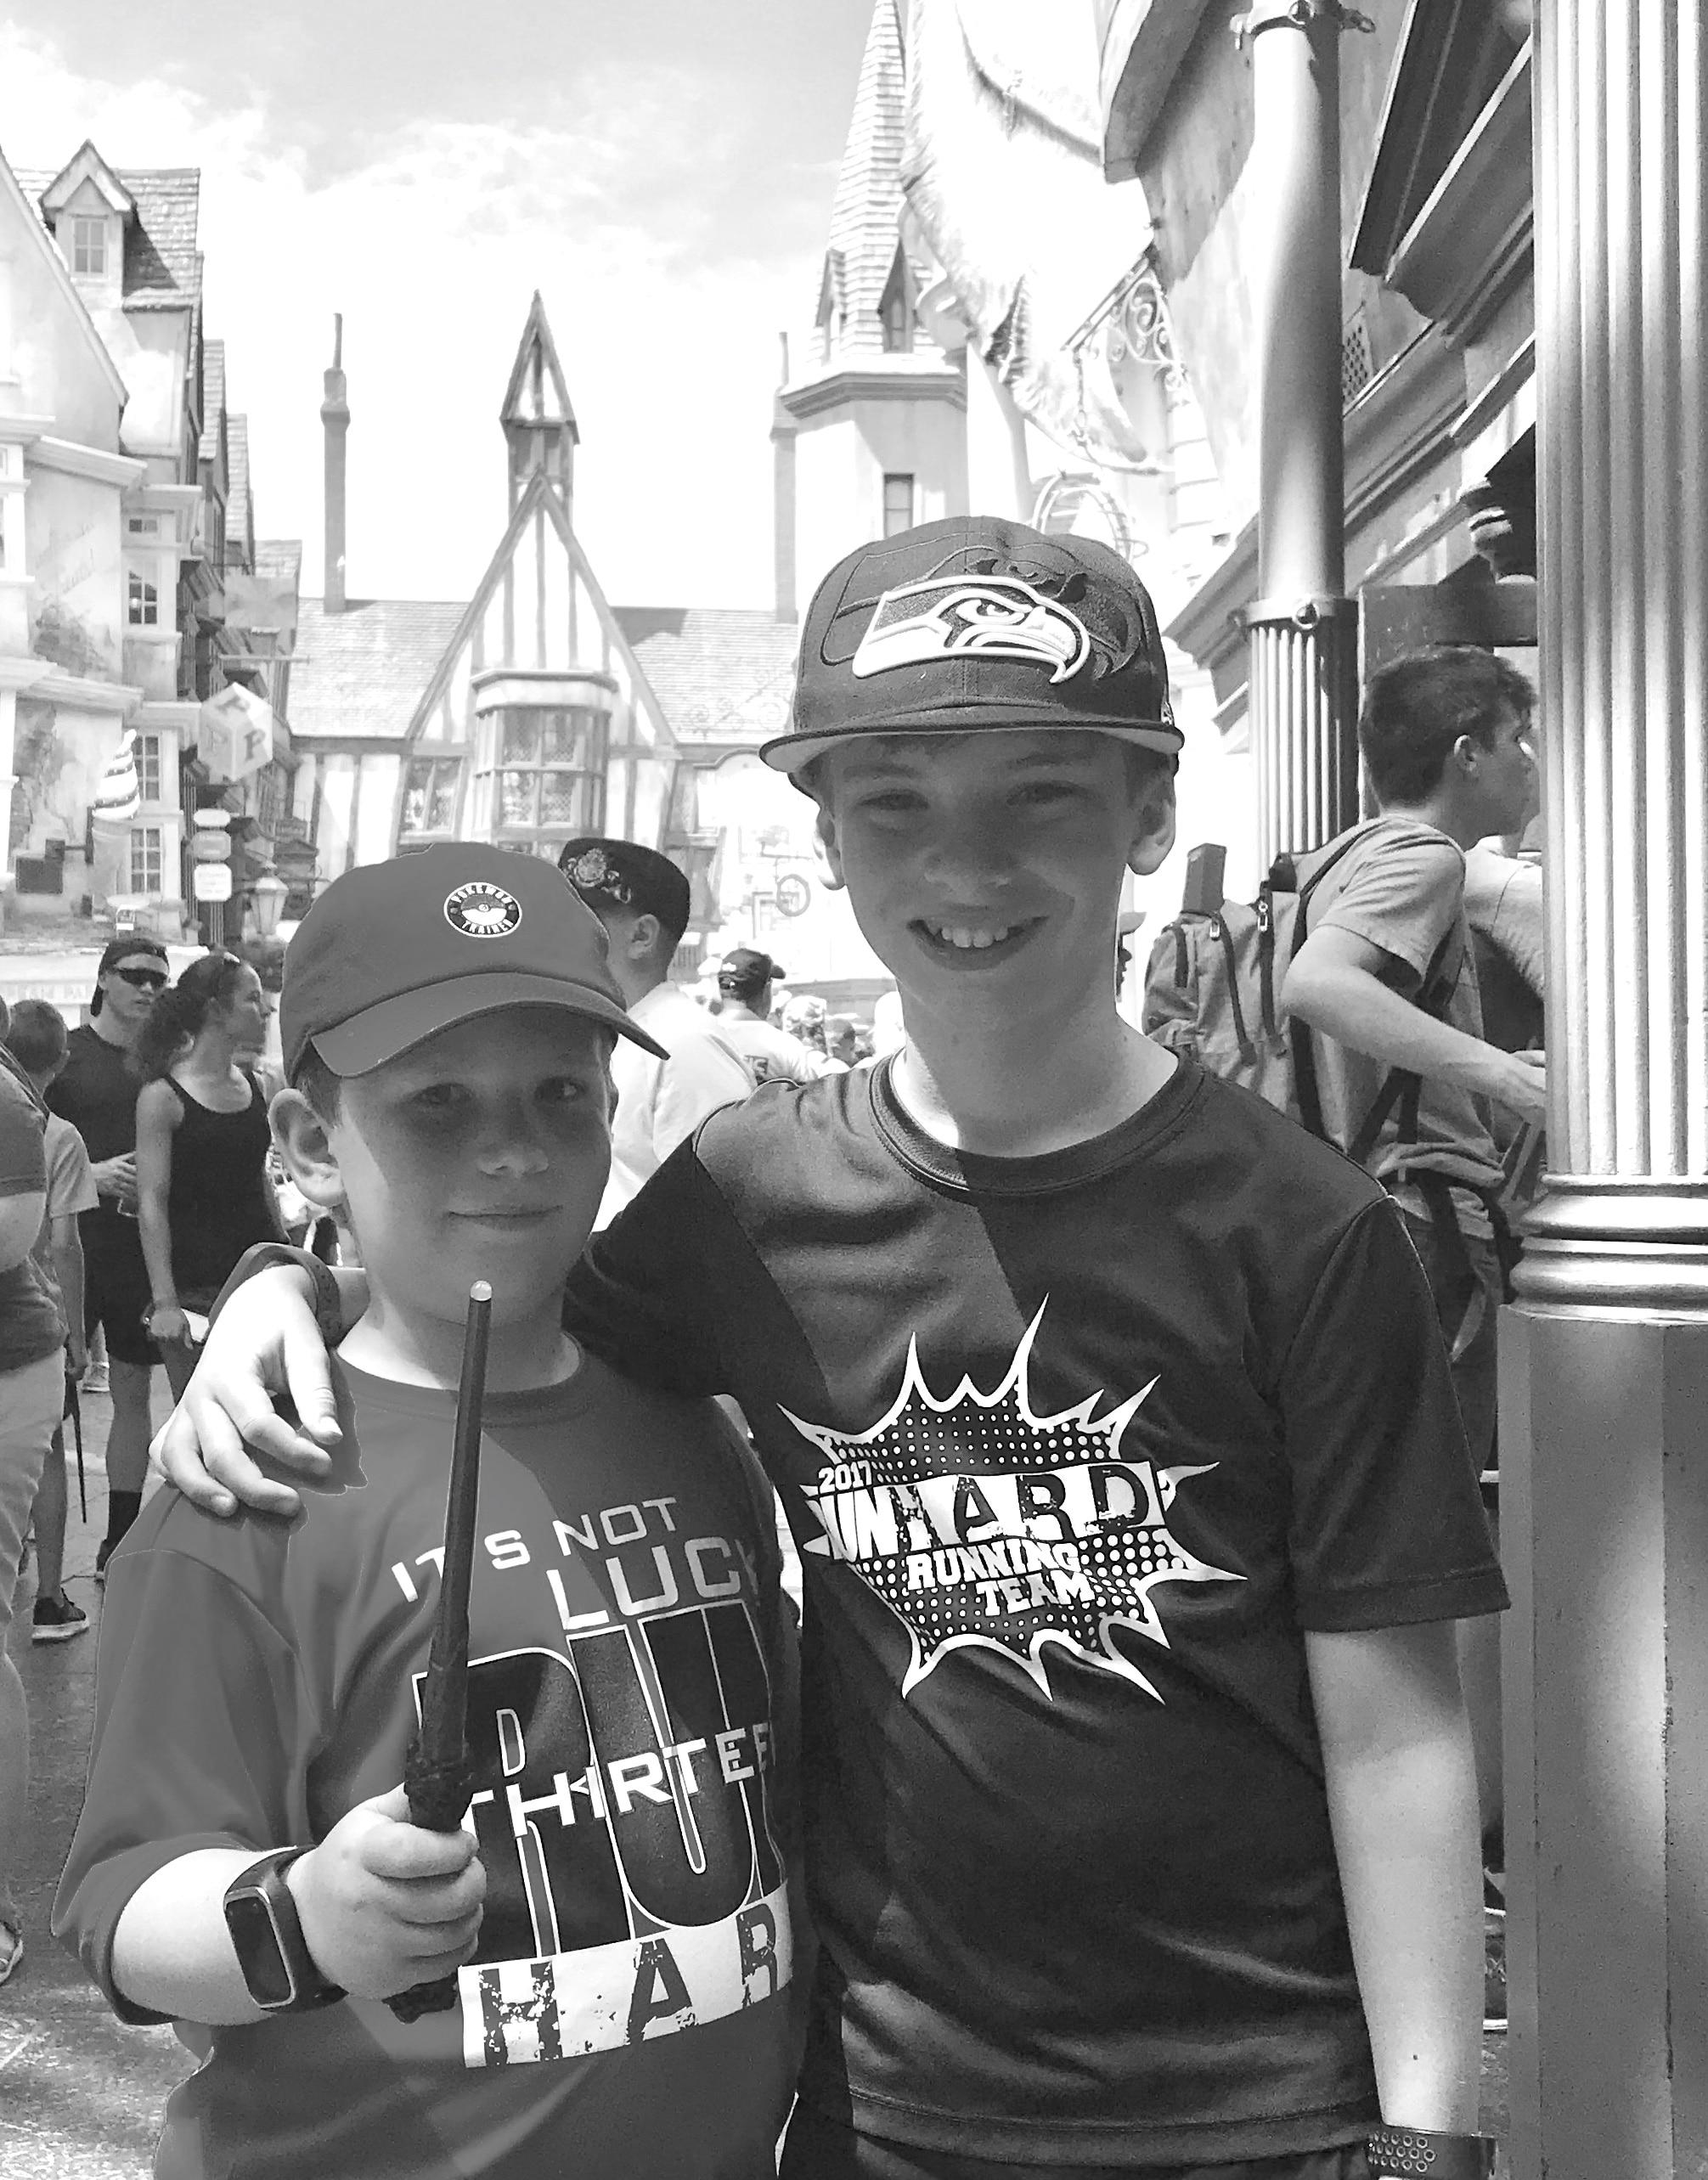 summer activities with kids - harry potter wizarding world